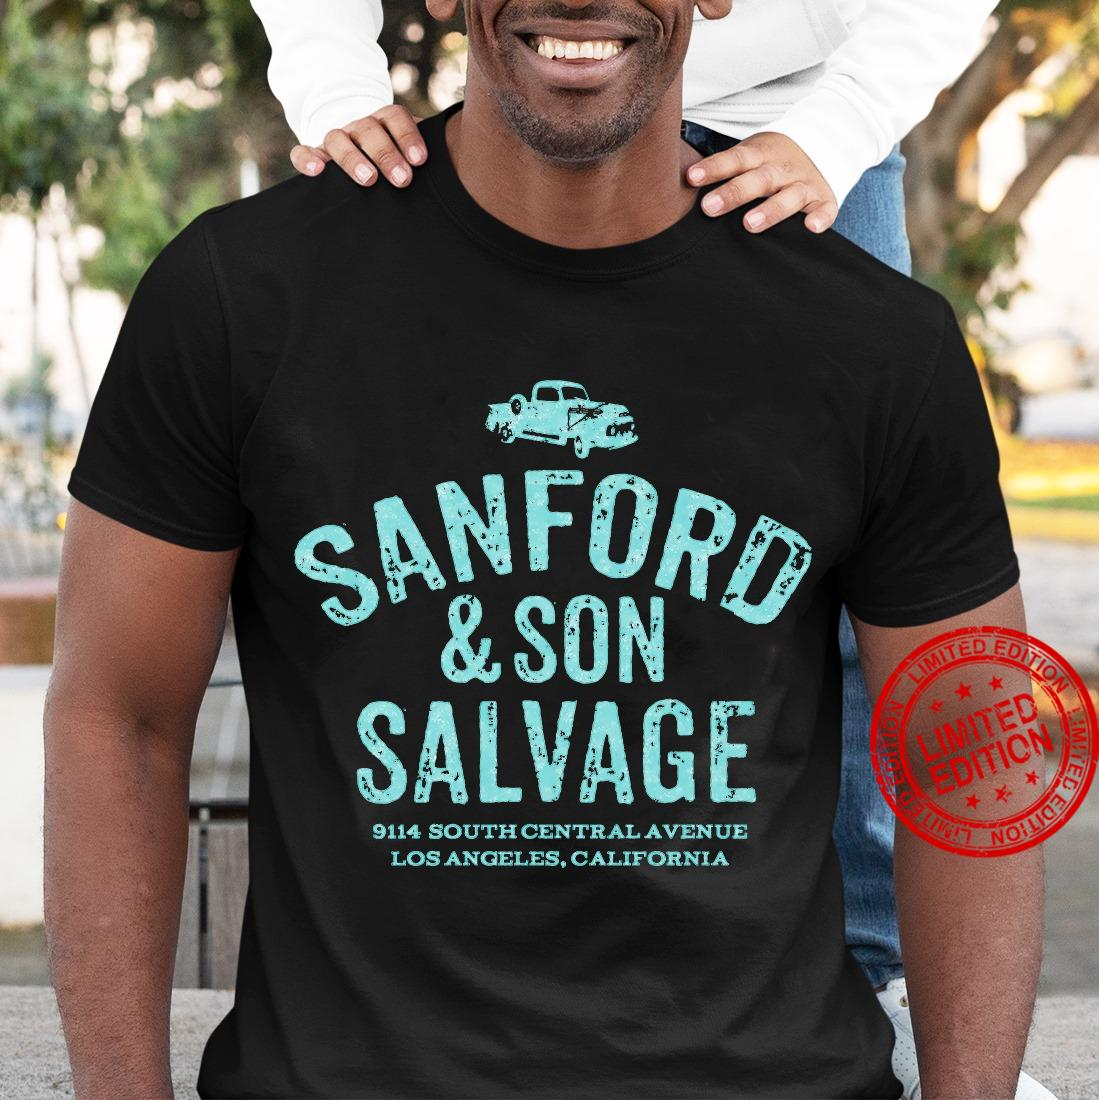 Sanford Son Salvage 914 South Central Avenue Los Angeles California Shirt